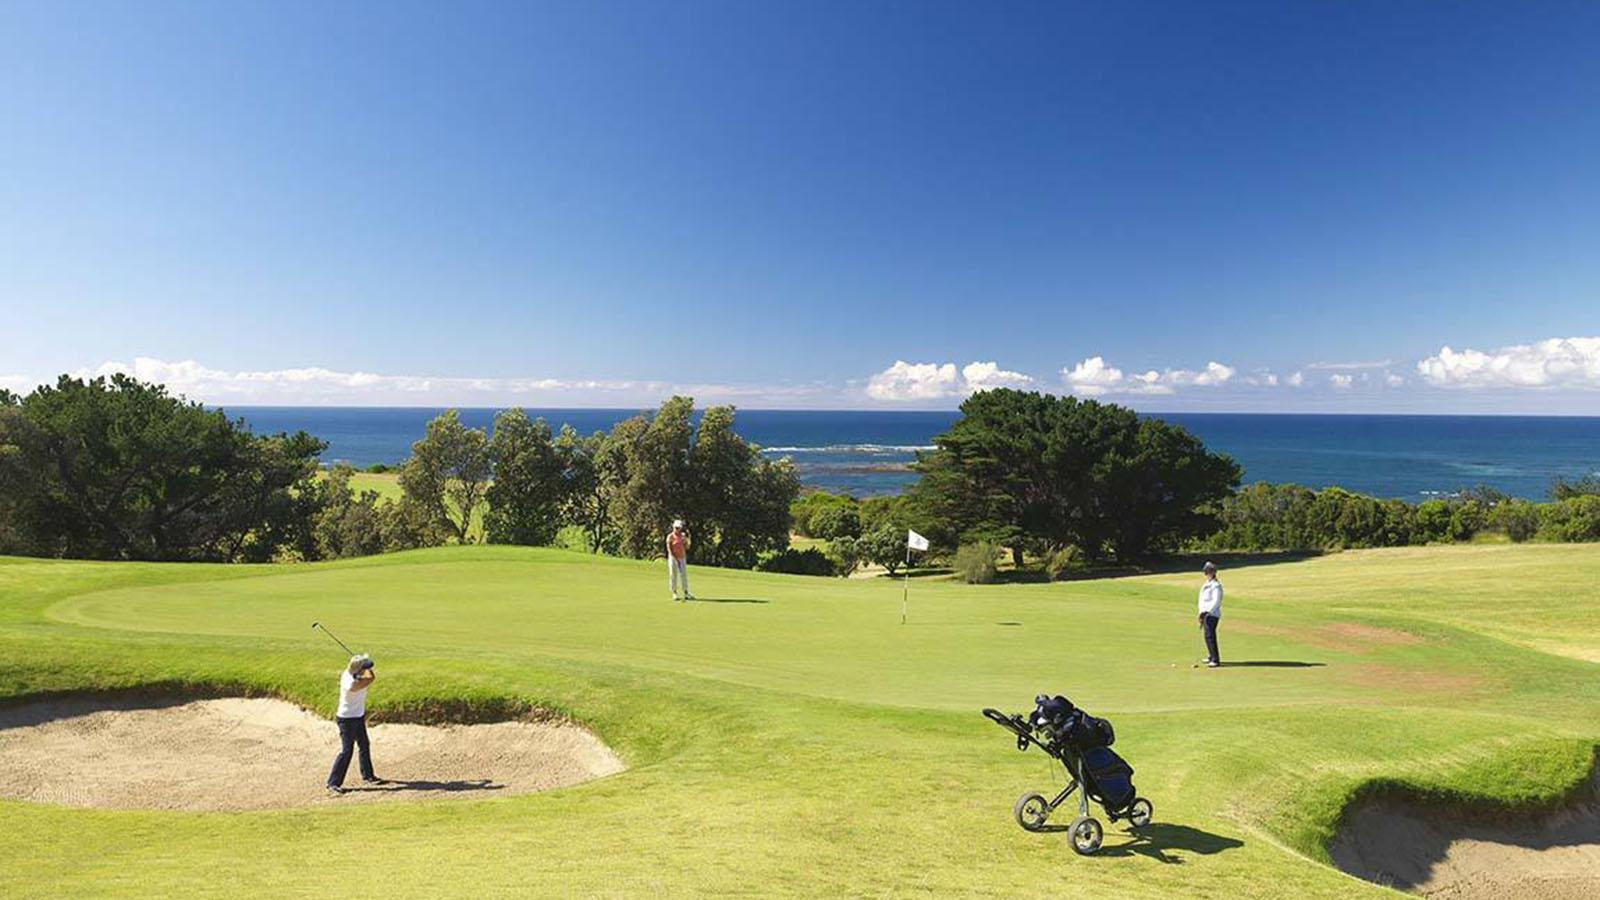 The Flinders Golf Club, Mornington Peninsula, Victoria, Australia